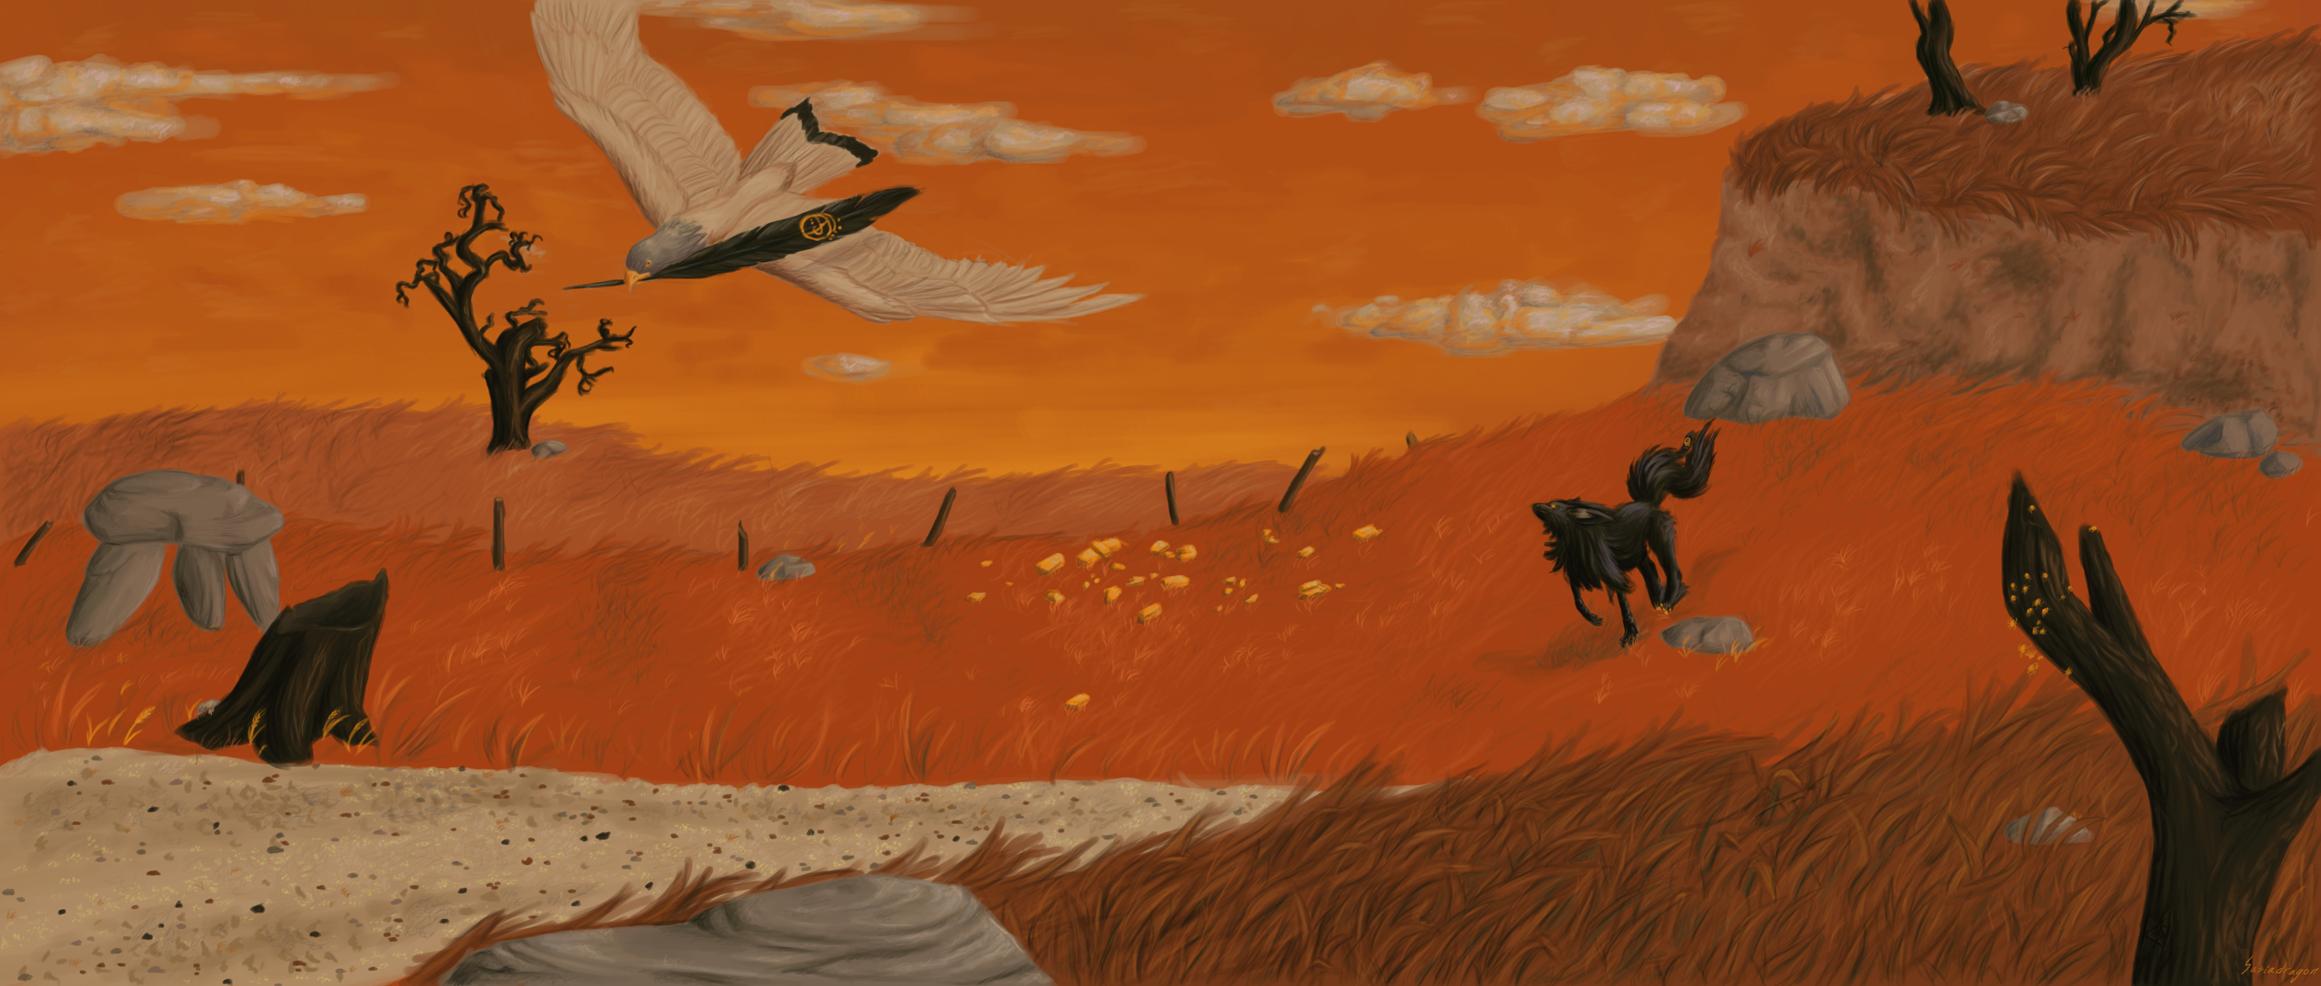 Illustrate to 'get your gun' by Sasiadragon